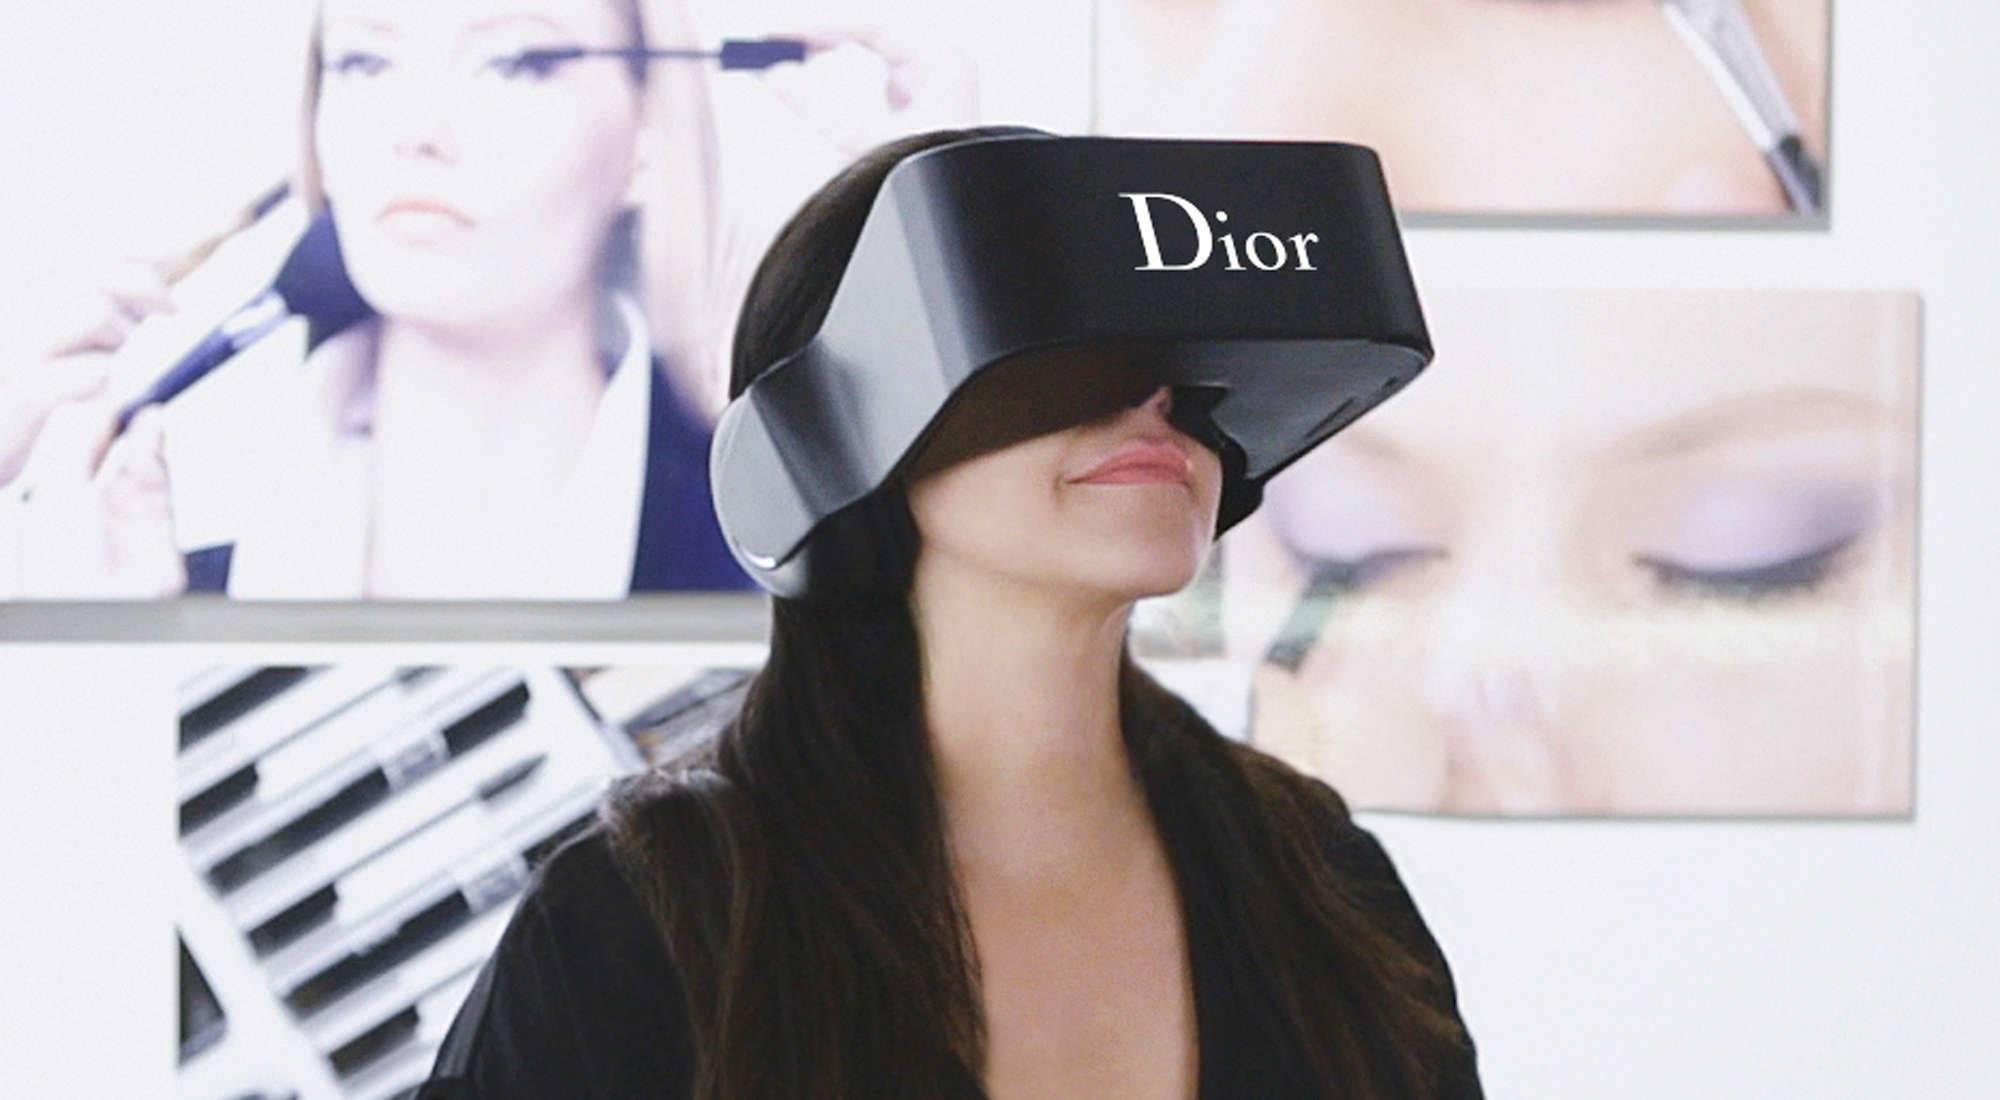 visuel-dior-eyes-hdr-2000x1100.jpg